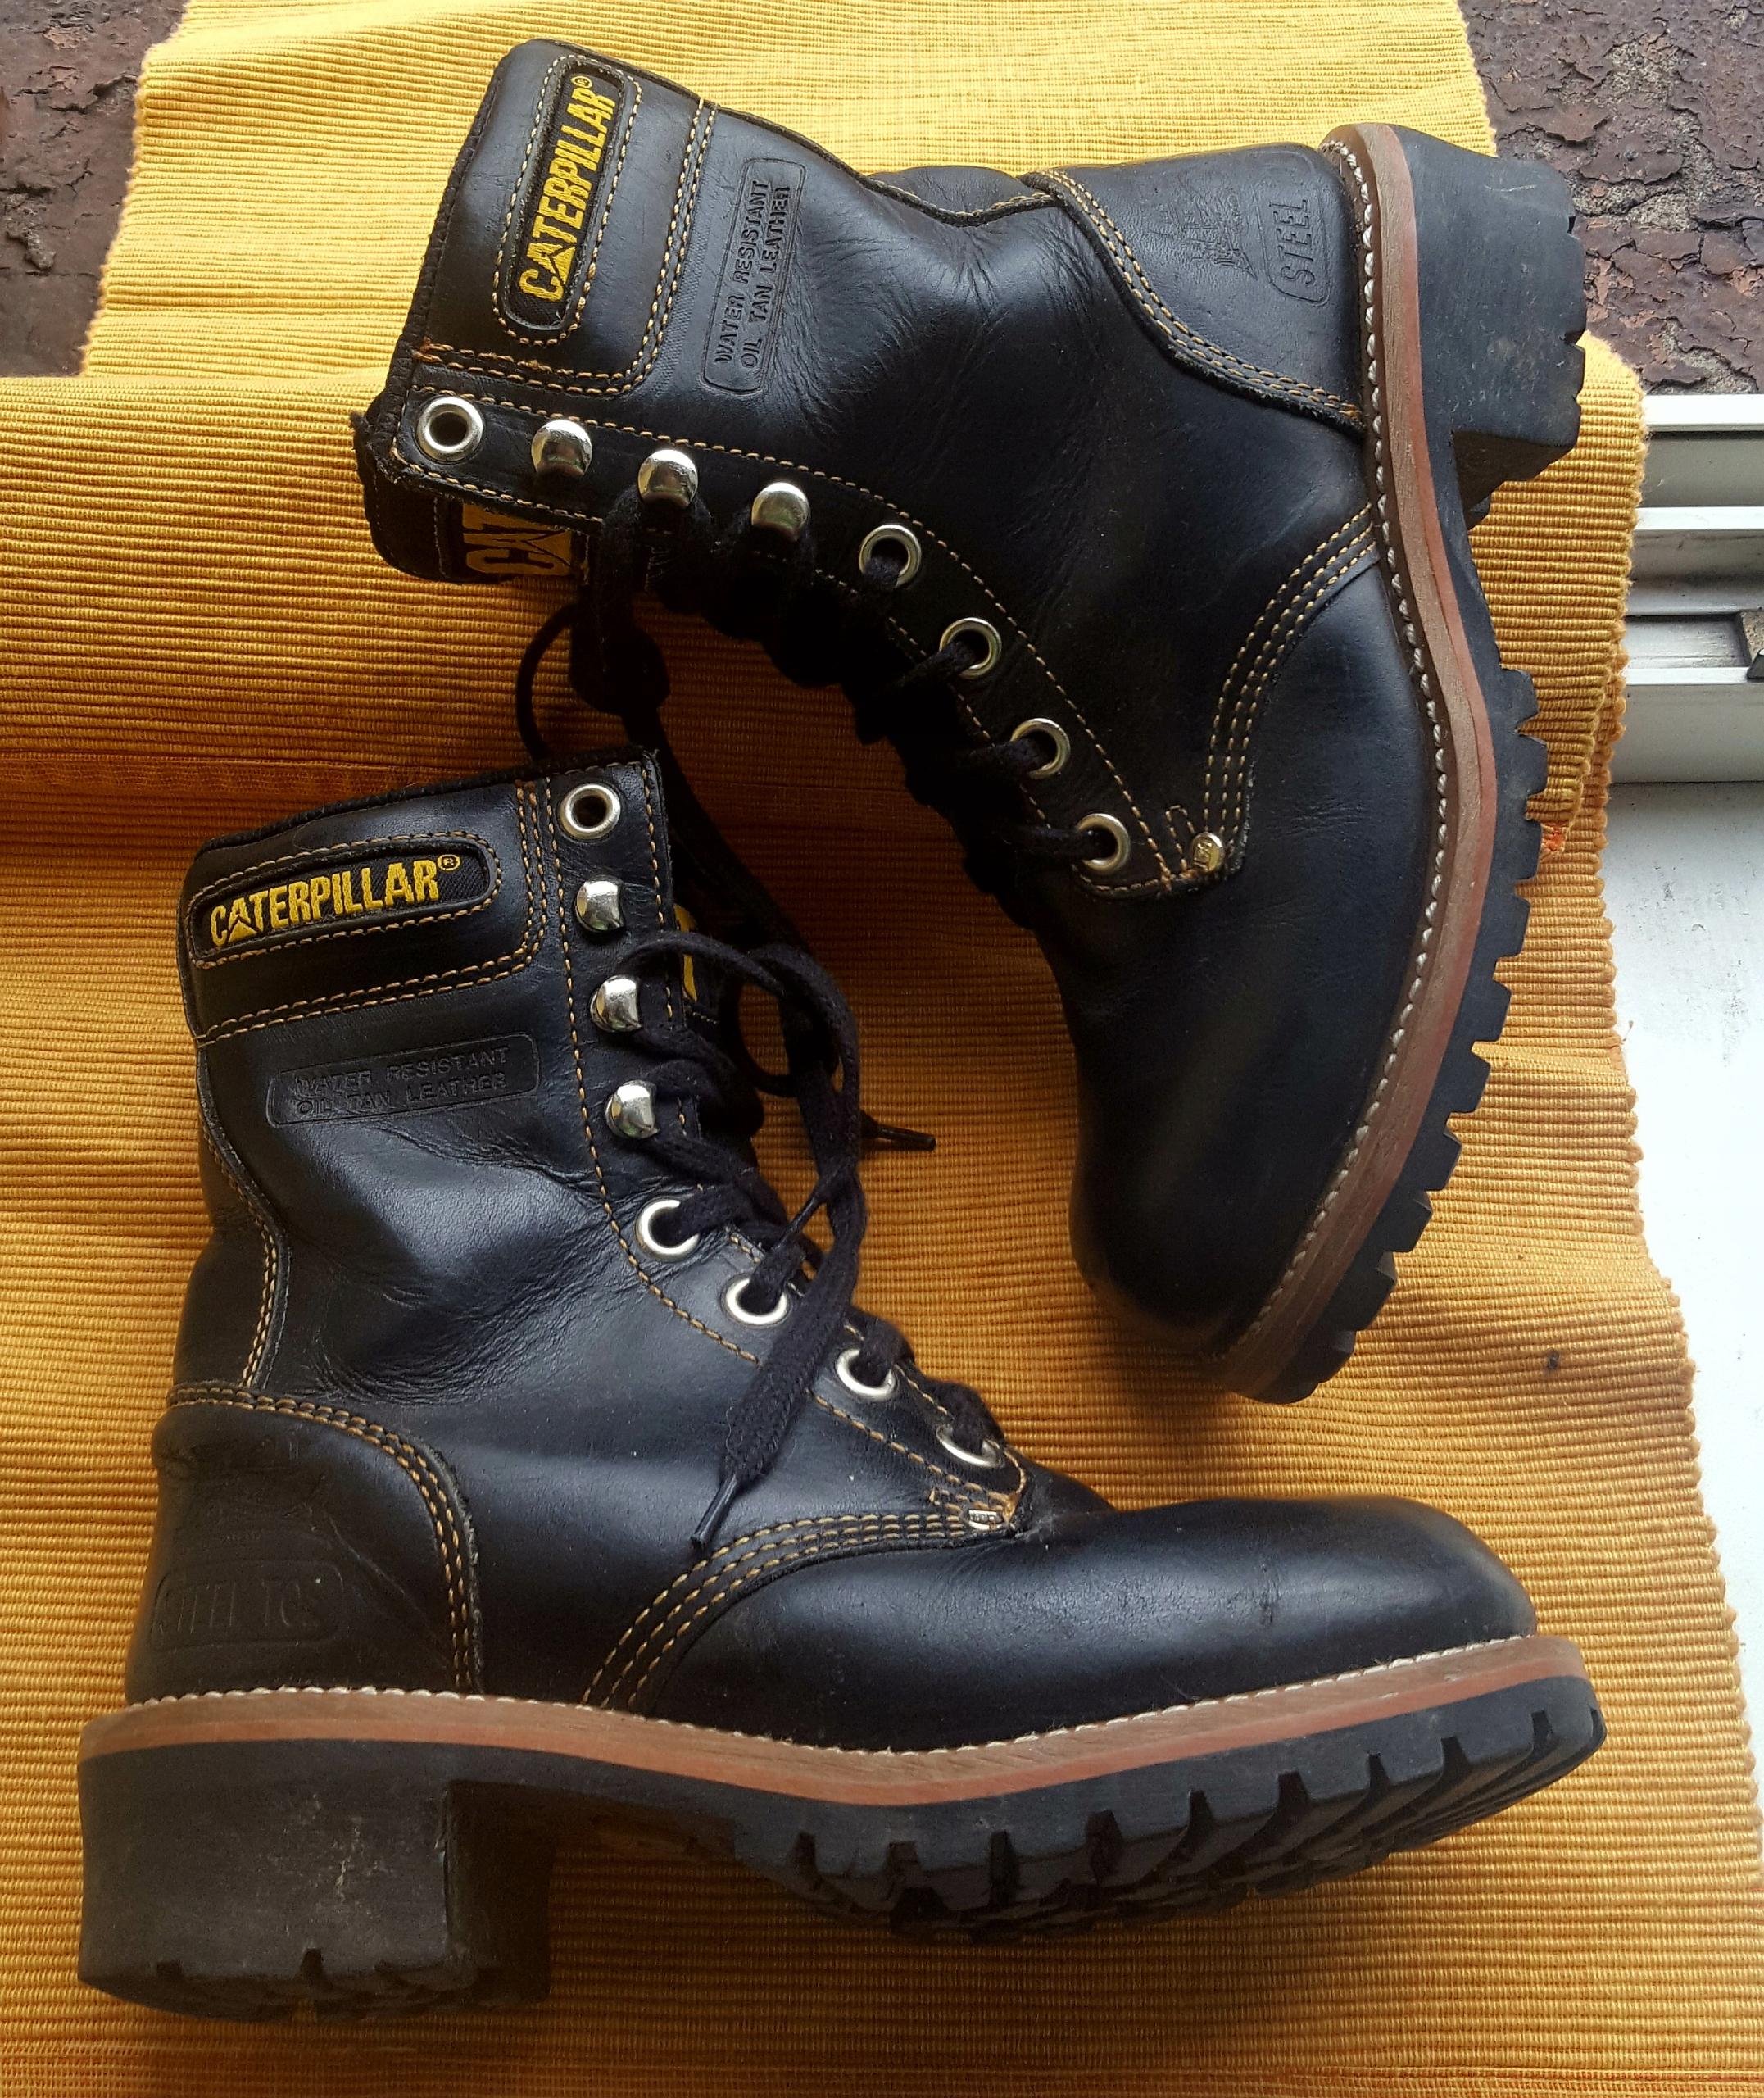 f816a8bb CAT Caterpillar glany biker boots workery skóra 36 - 7679070143 ...